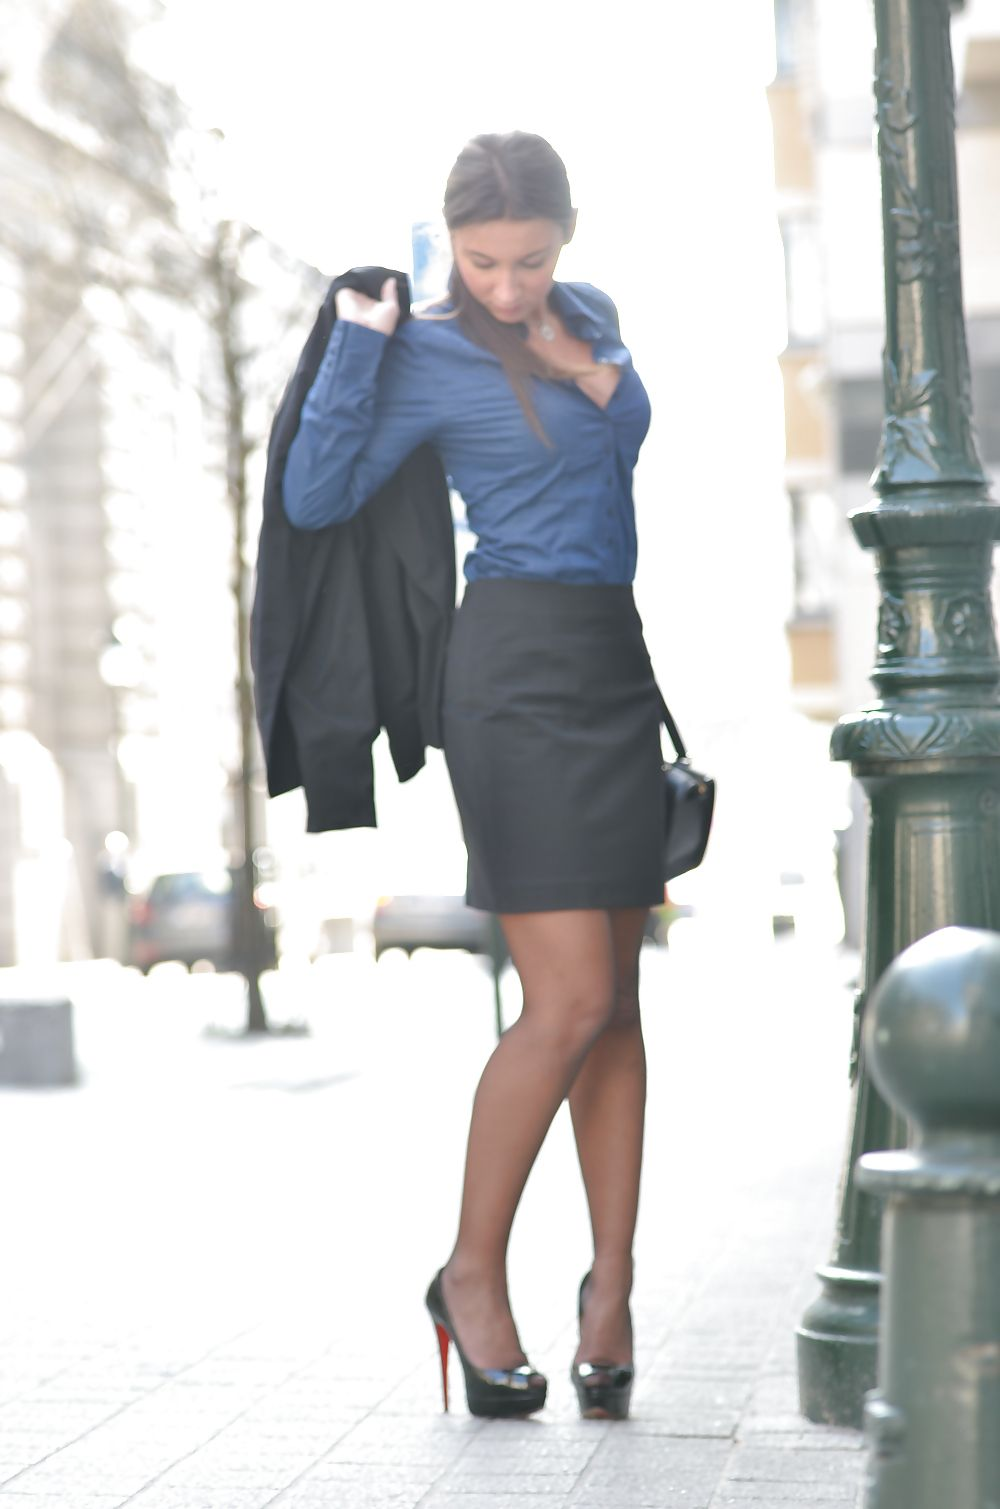 Females wearing pantyhose and heels